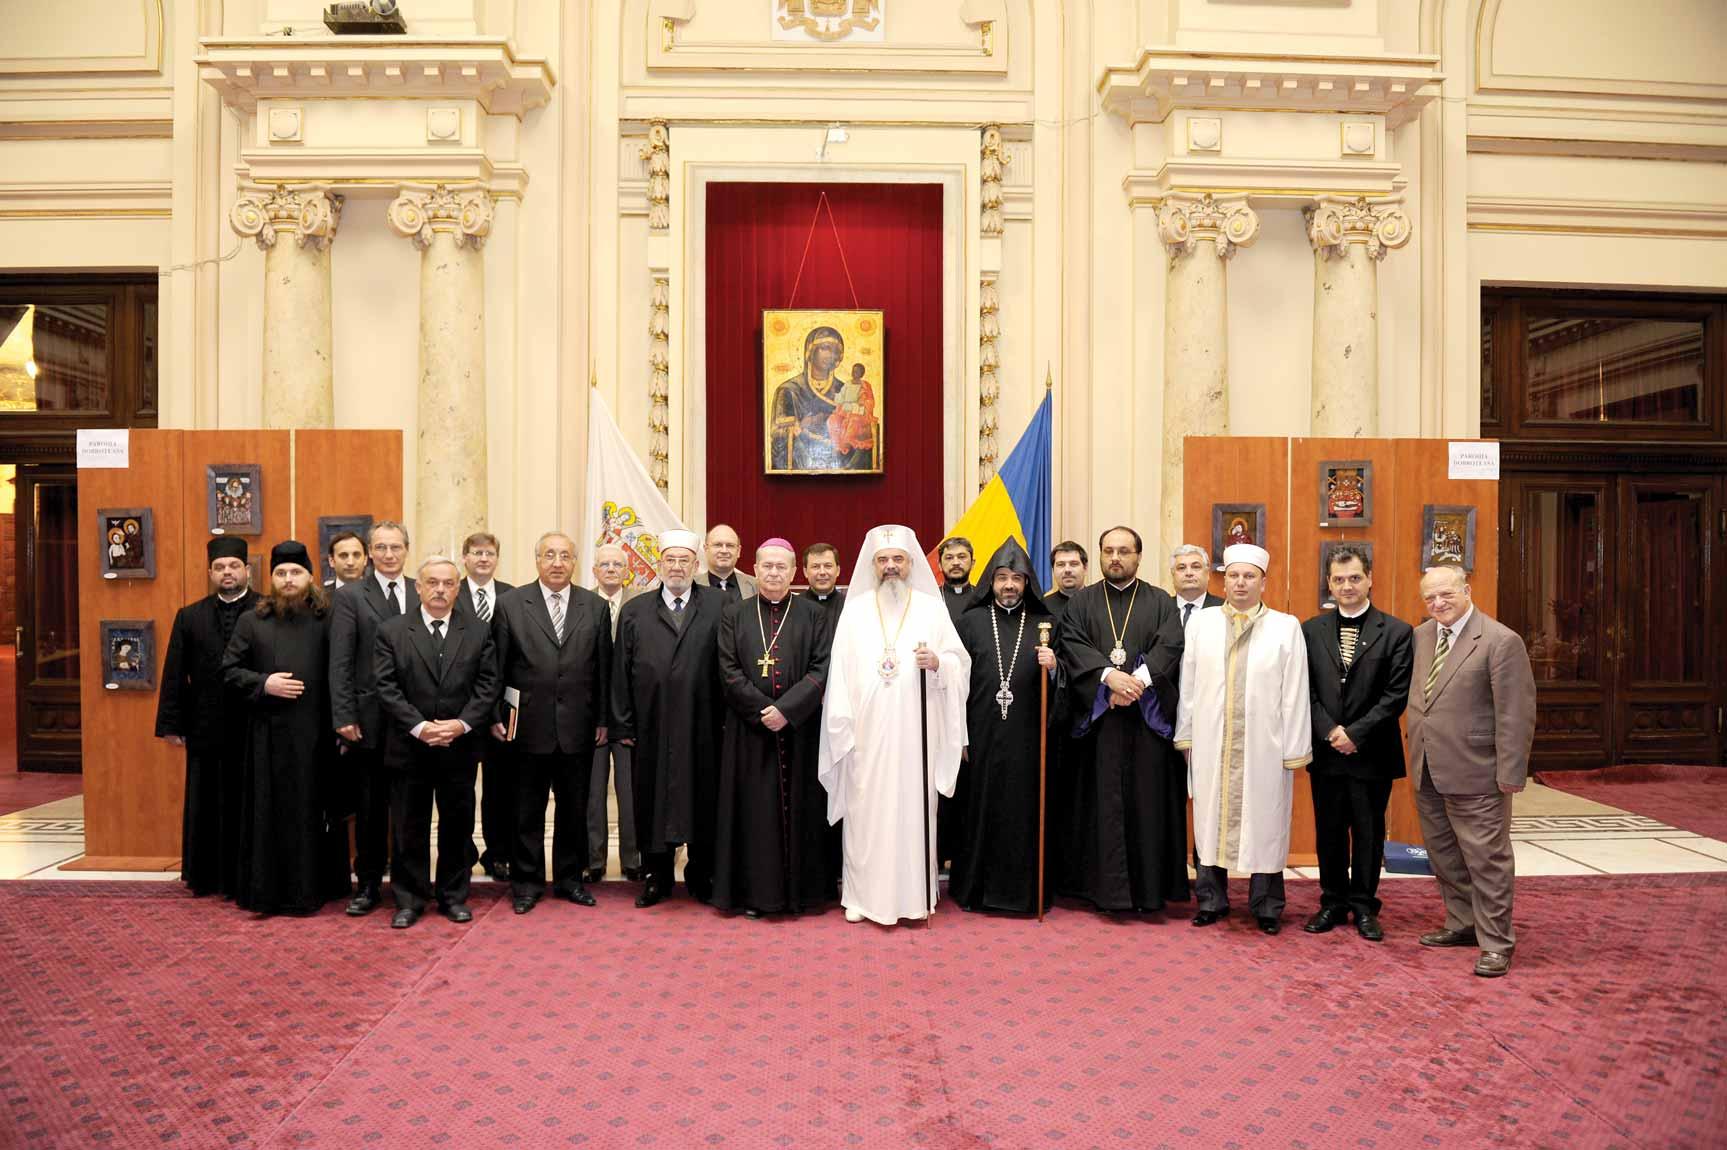 Consiliul Consultativ al Cultelor din România / Consultative Council of the Religions in Romania